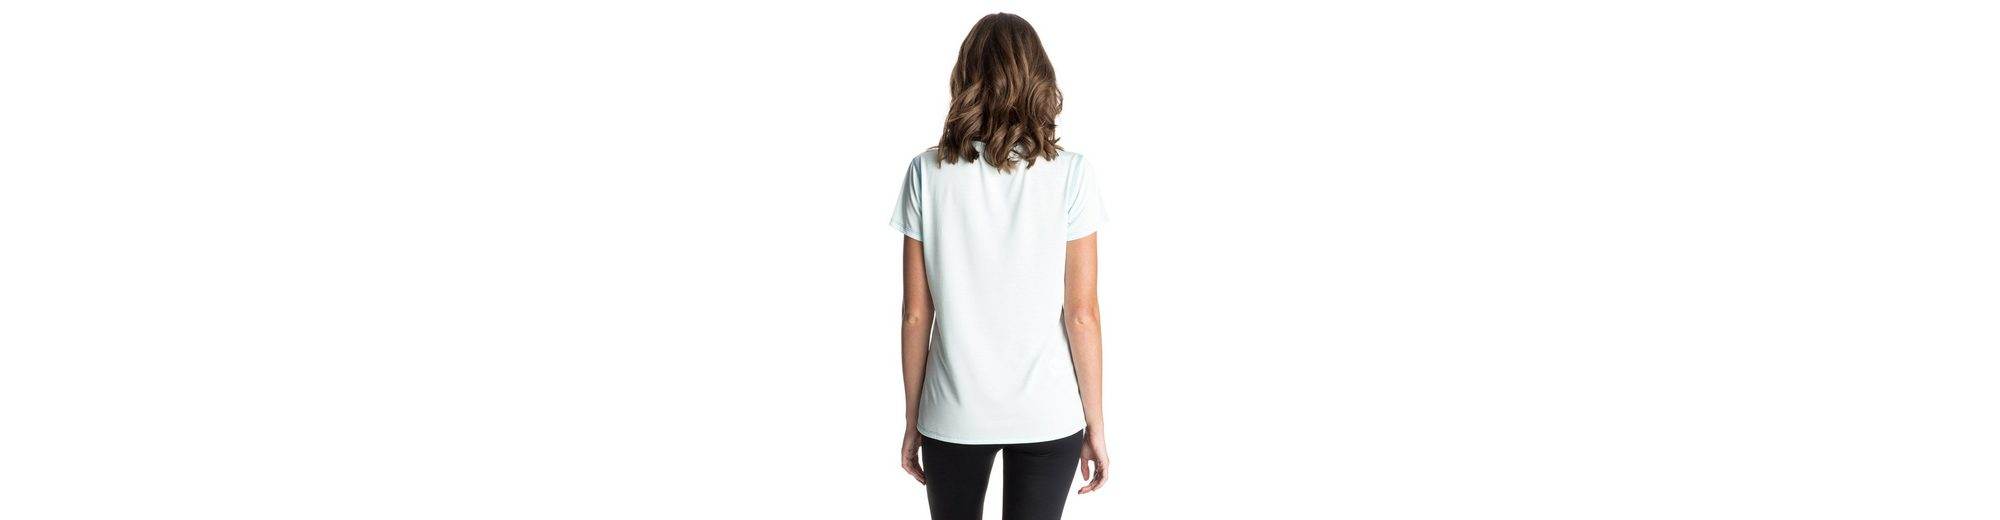 Roxy T-Shirt Cutback Günstiger Preis Großhandel gghMX52Dp